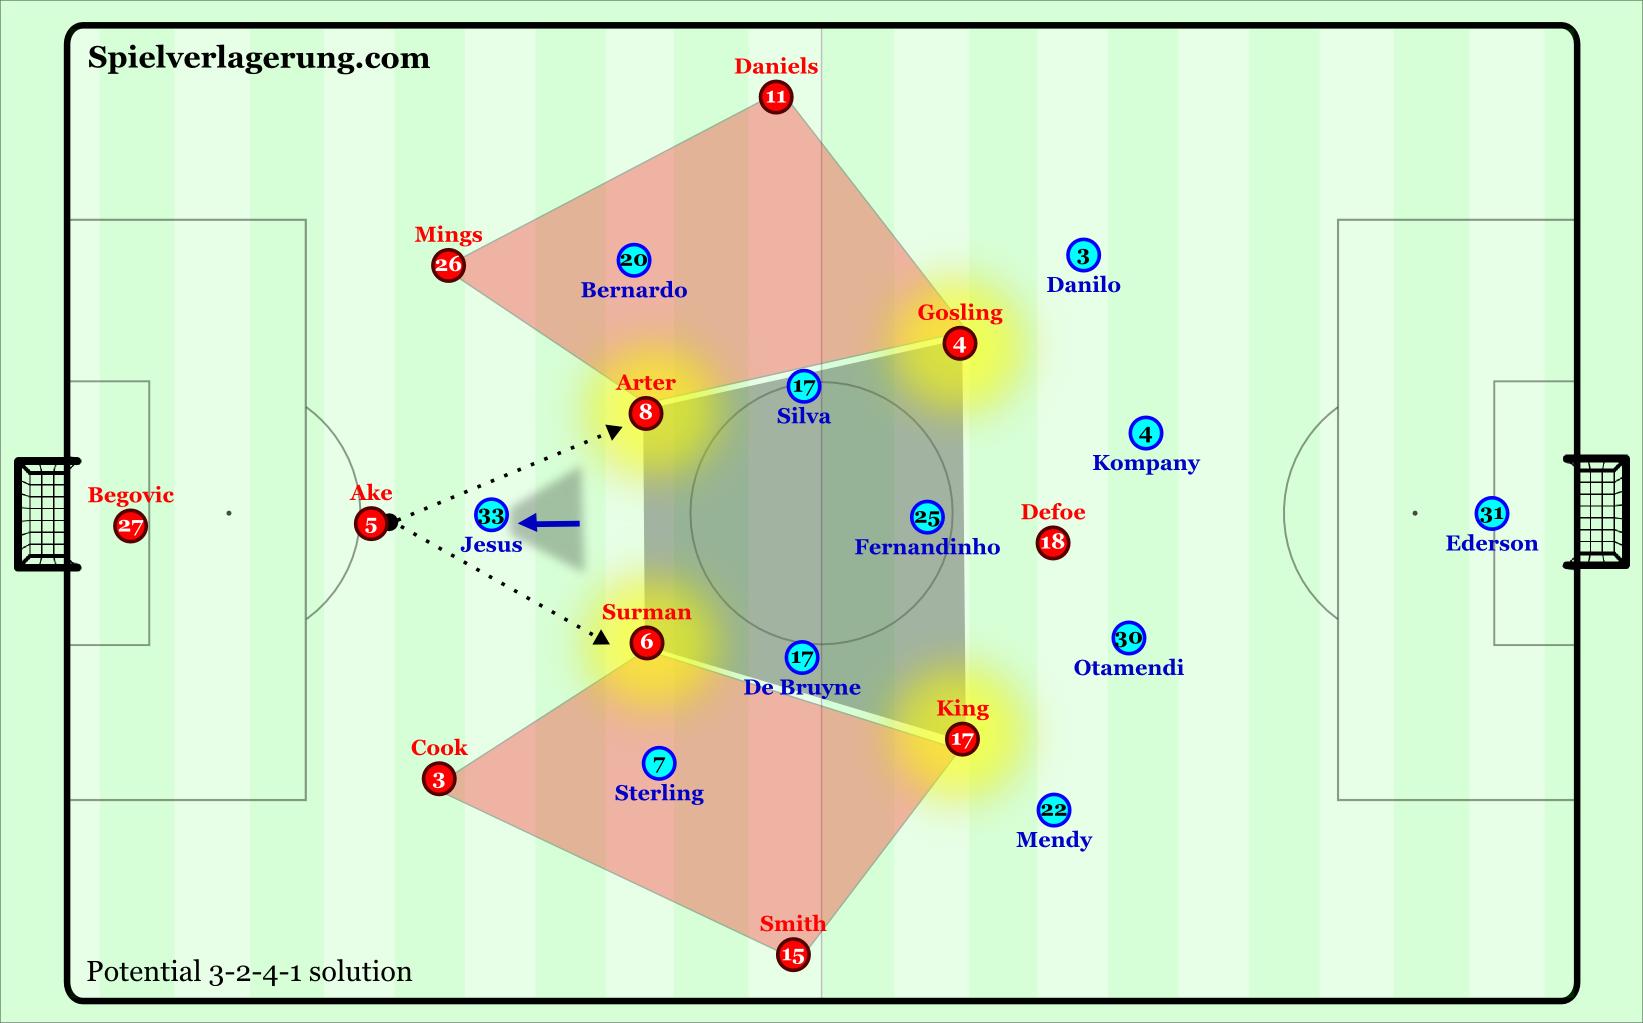 AFCB potential solution